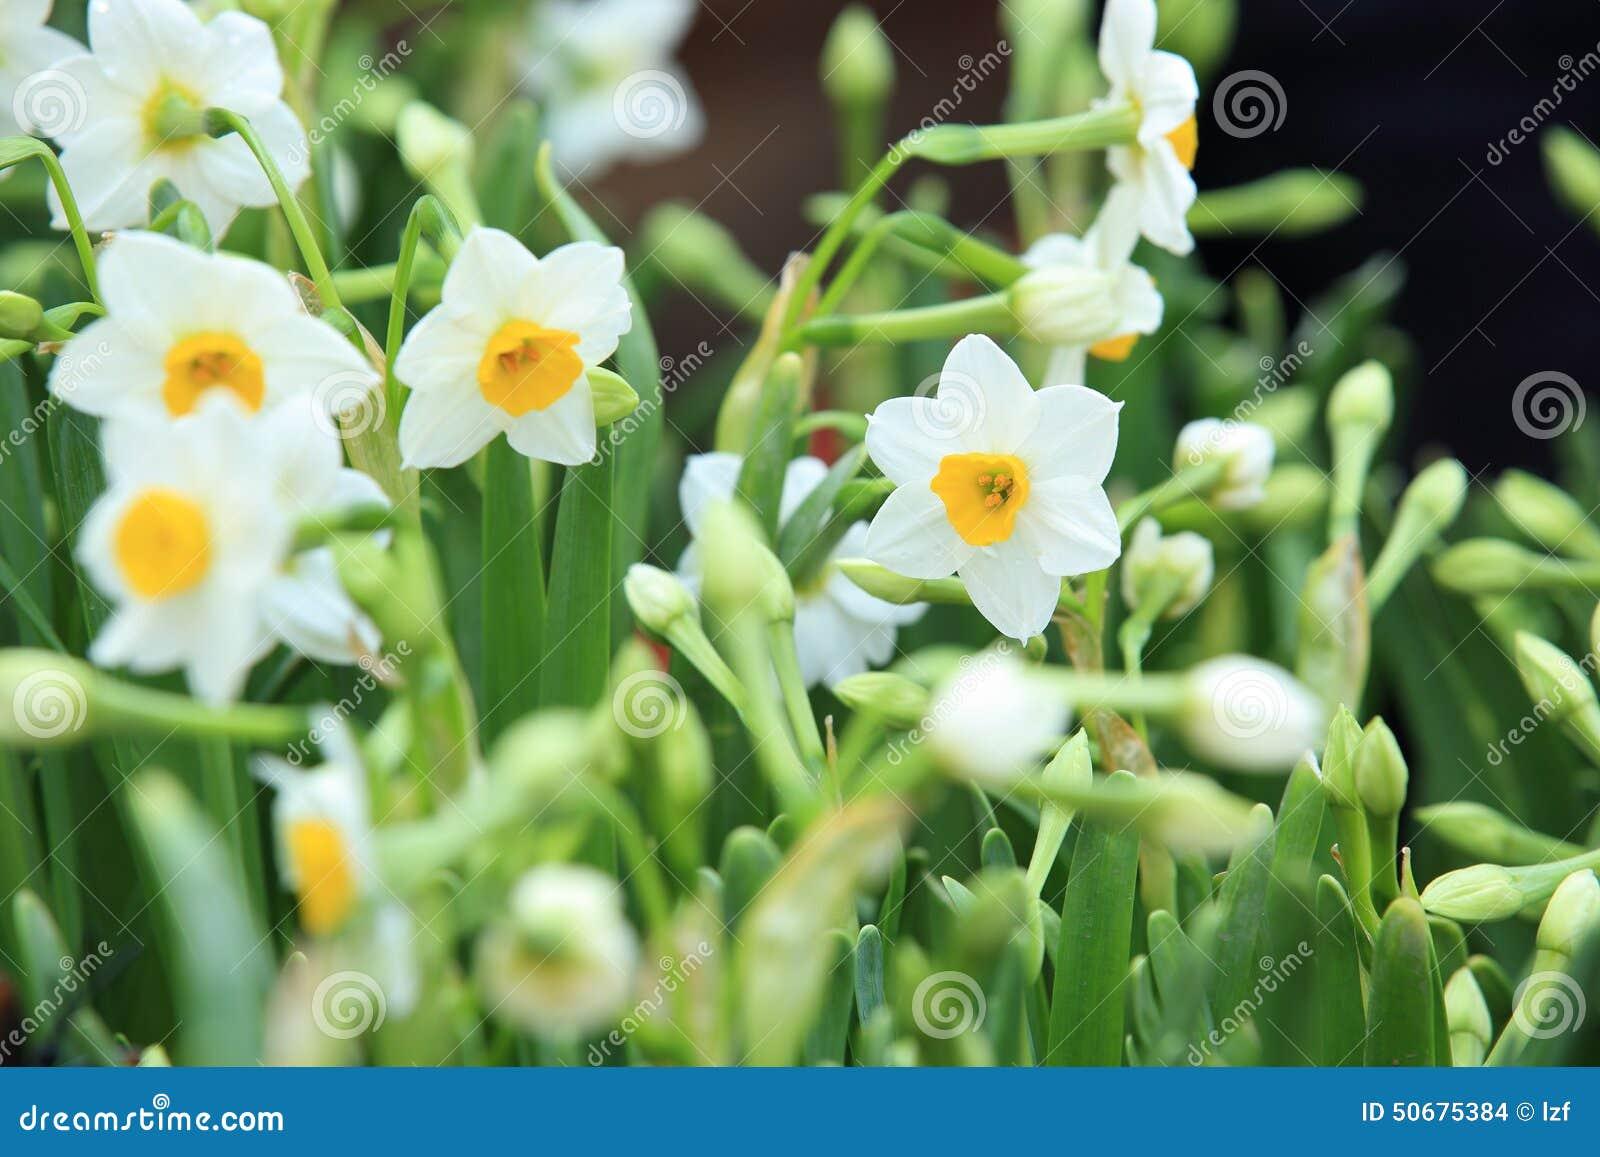 Download 白色美丽的水仙花 库存照片. 图片 包括有 黄水仙, 通配, 空白, 叶子, 黄色, 工厂, 庭院, beautifuler - 50675384